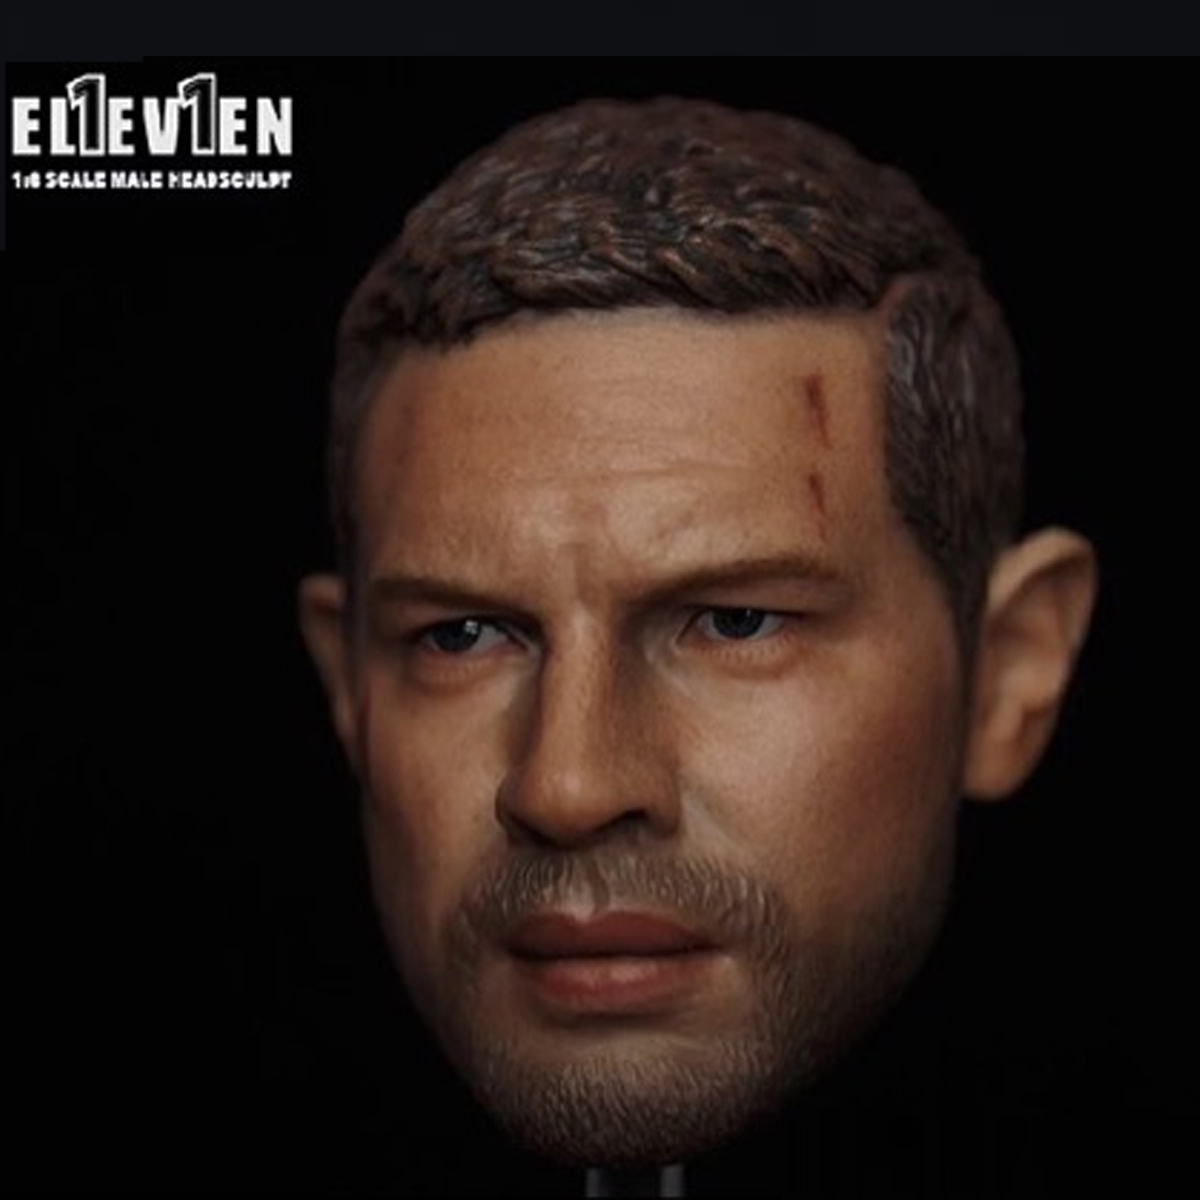 Venom Tom Hardy Mad Max 4 1//6 Head Carving Unpainted Sculpt Model Accessory